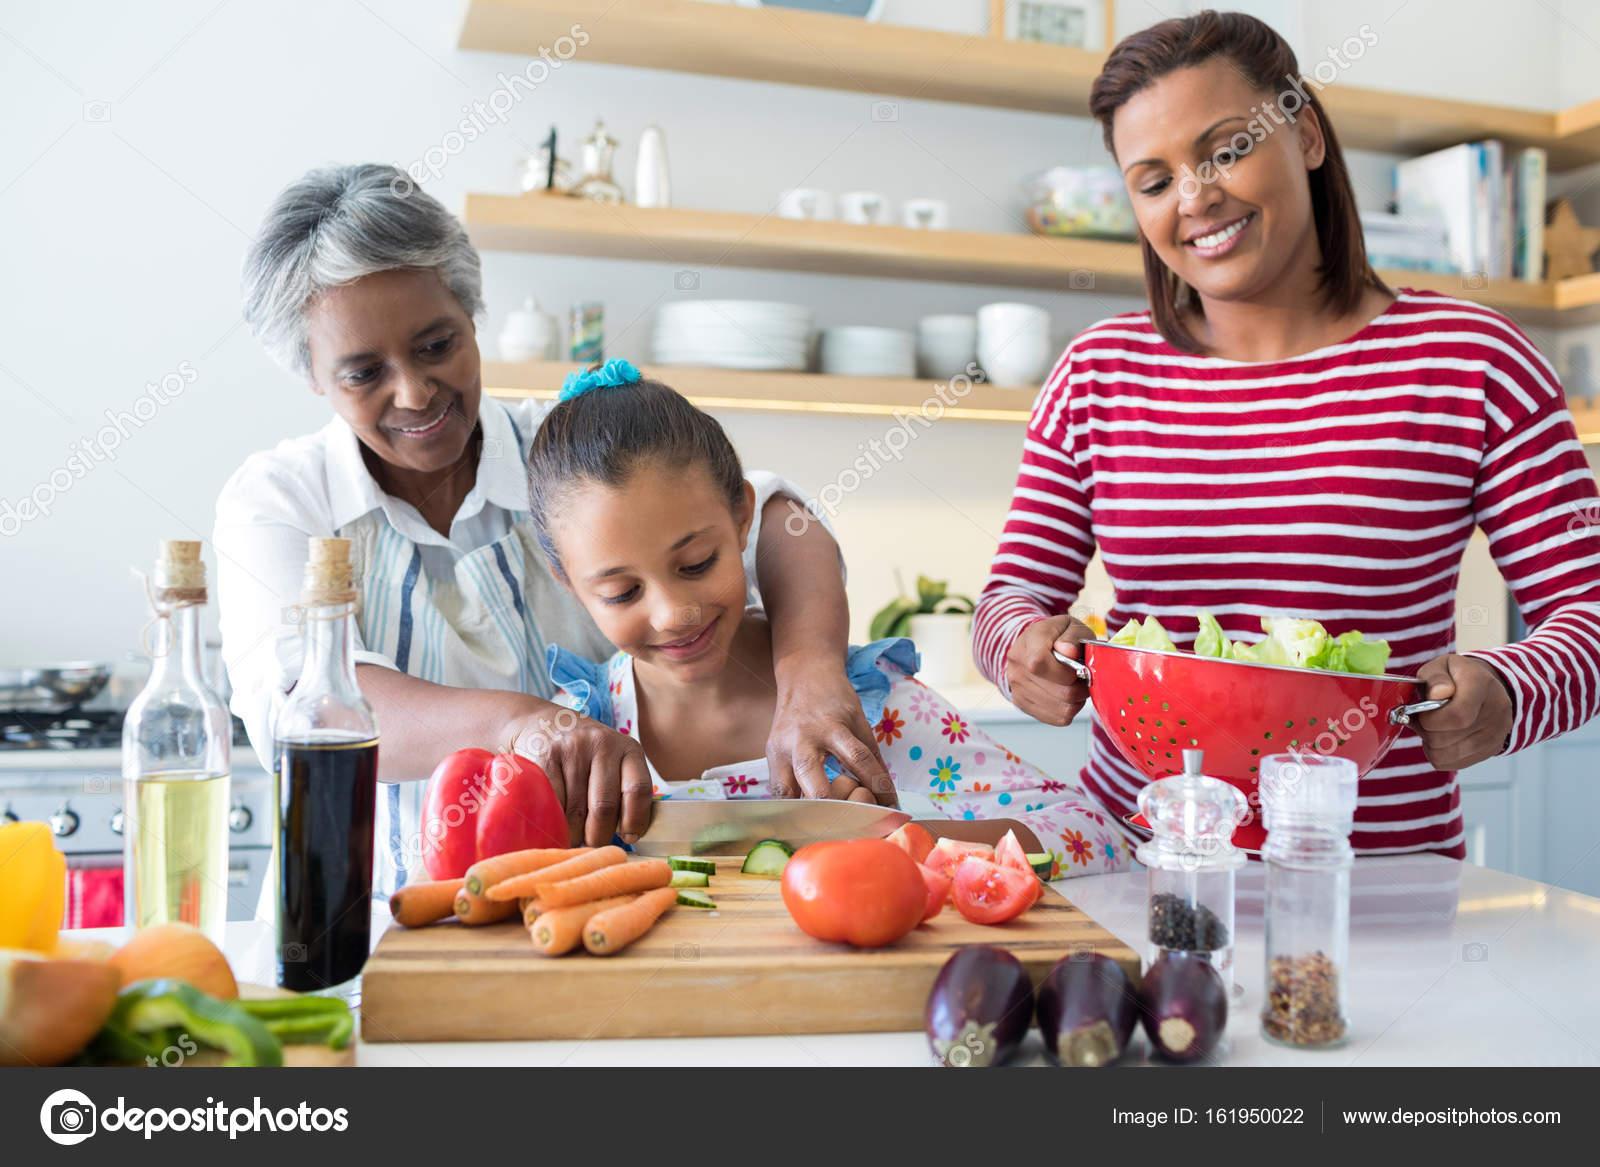 Großmutter, Enkelin, Gemüse Hacken zu unterstützen — Stockfoto ...